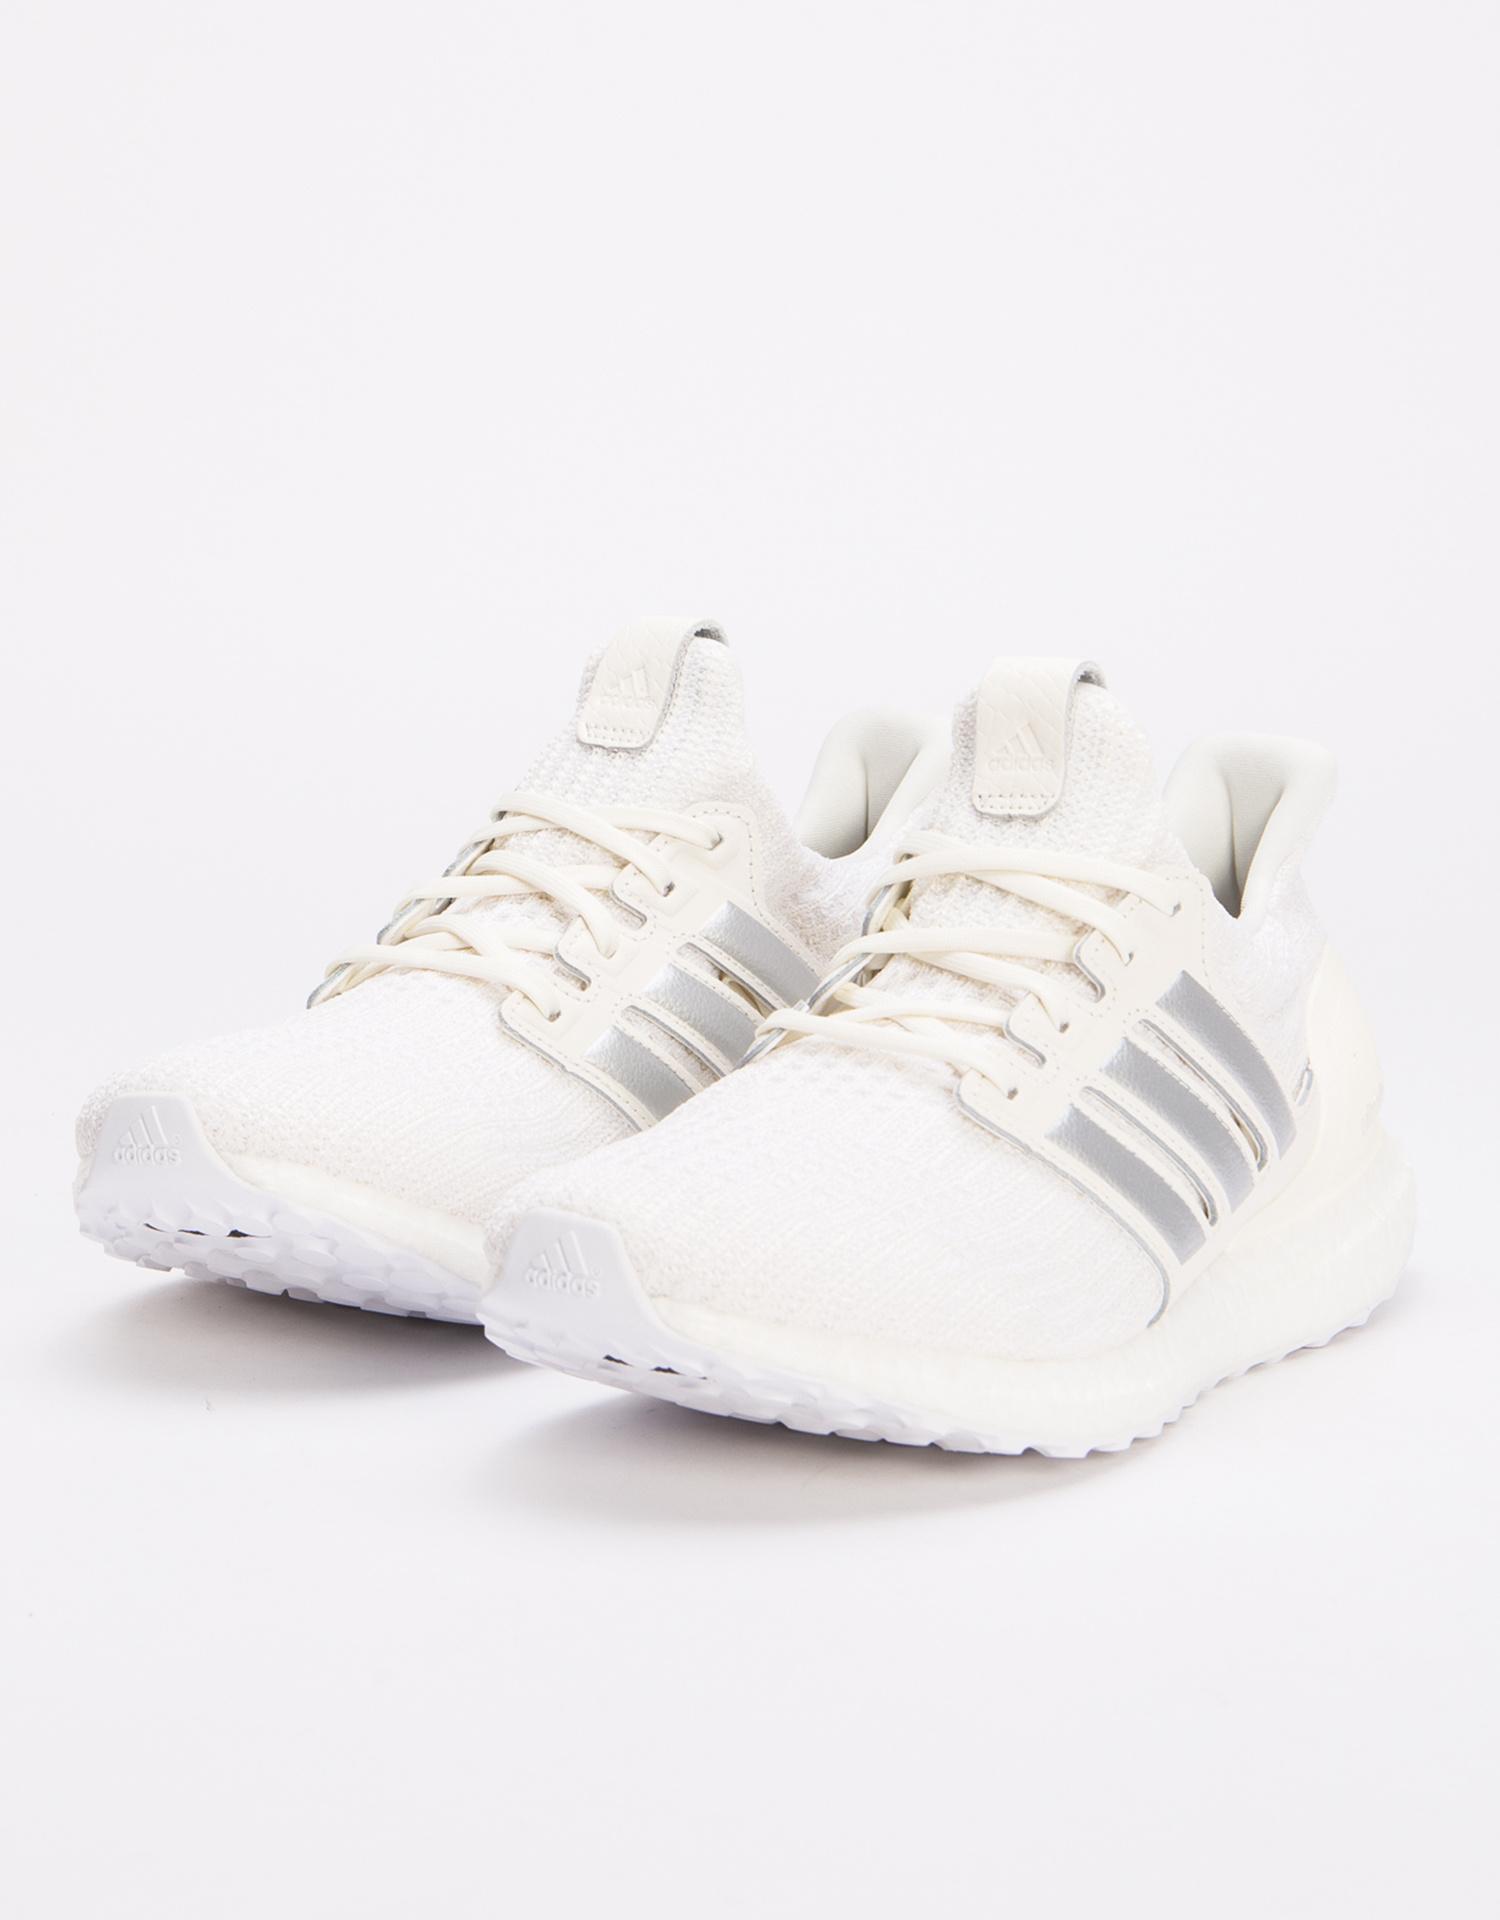 3825abd20c5bb Adidas ultraboost x got w owhite silvmt cblack - Avenue Store